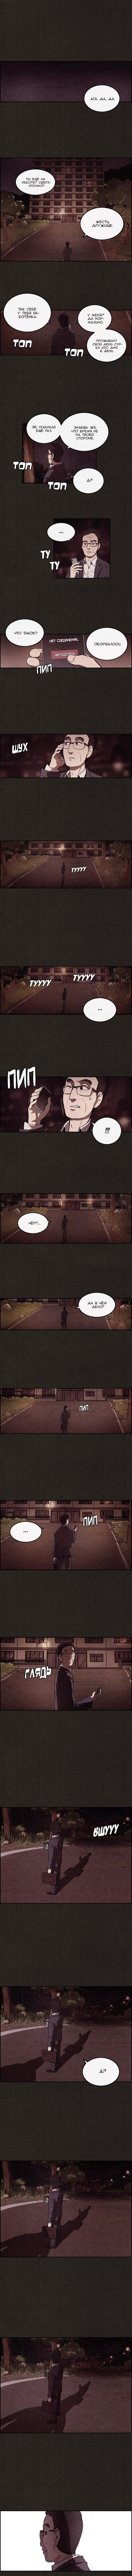 https://r1.ninemanga.com/comics/pic2/26/33050/415966/1532297470961.jpg Page 1